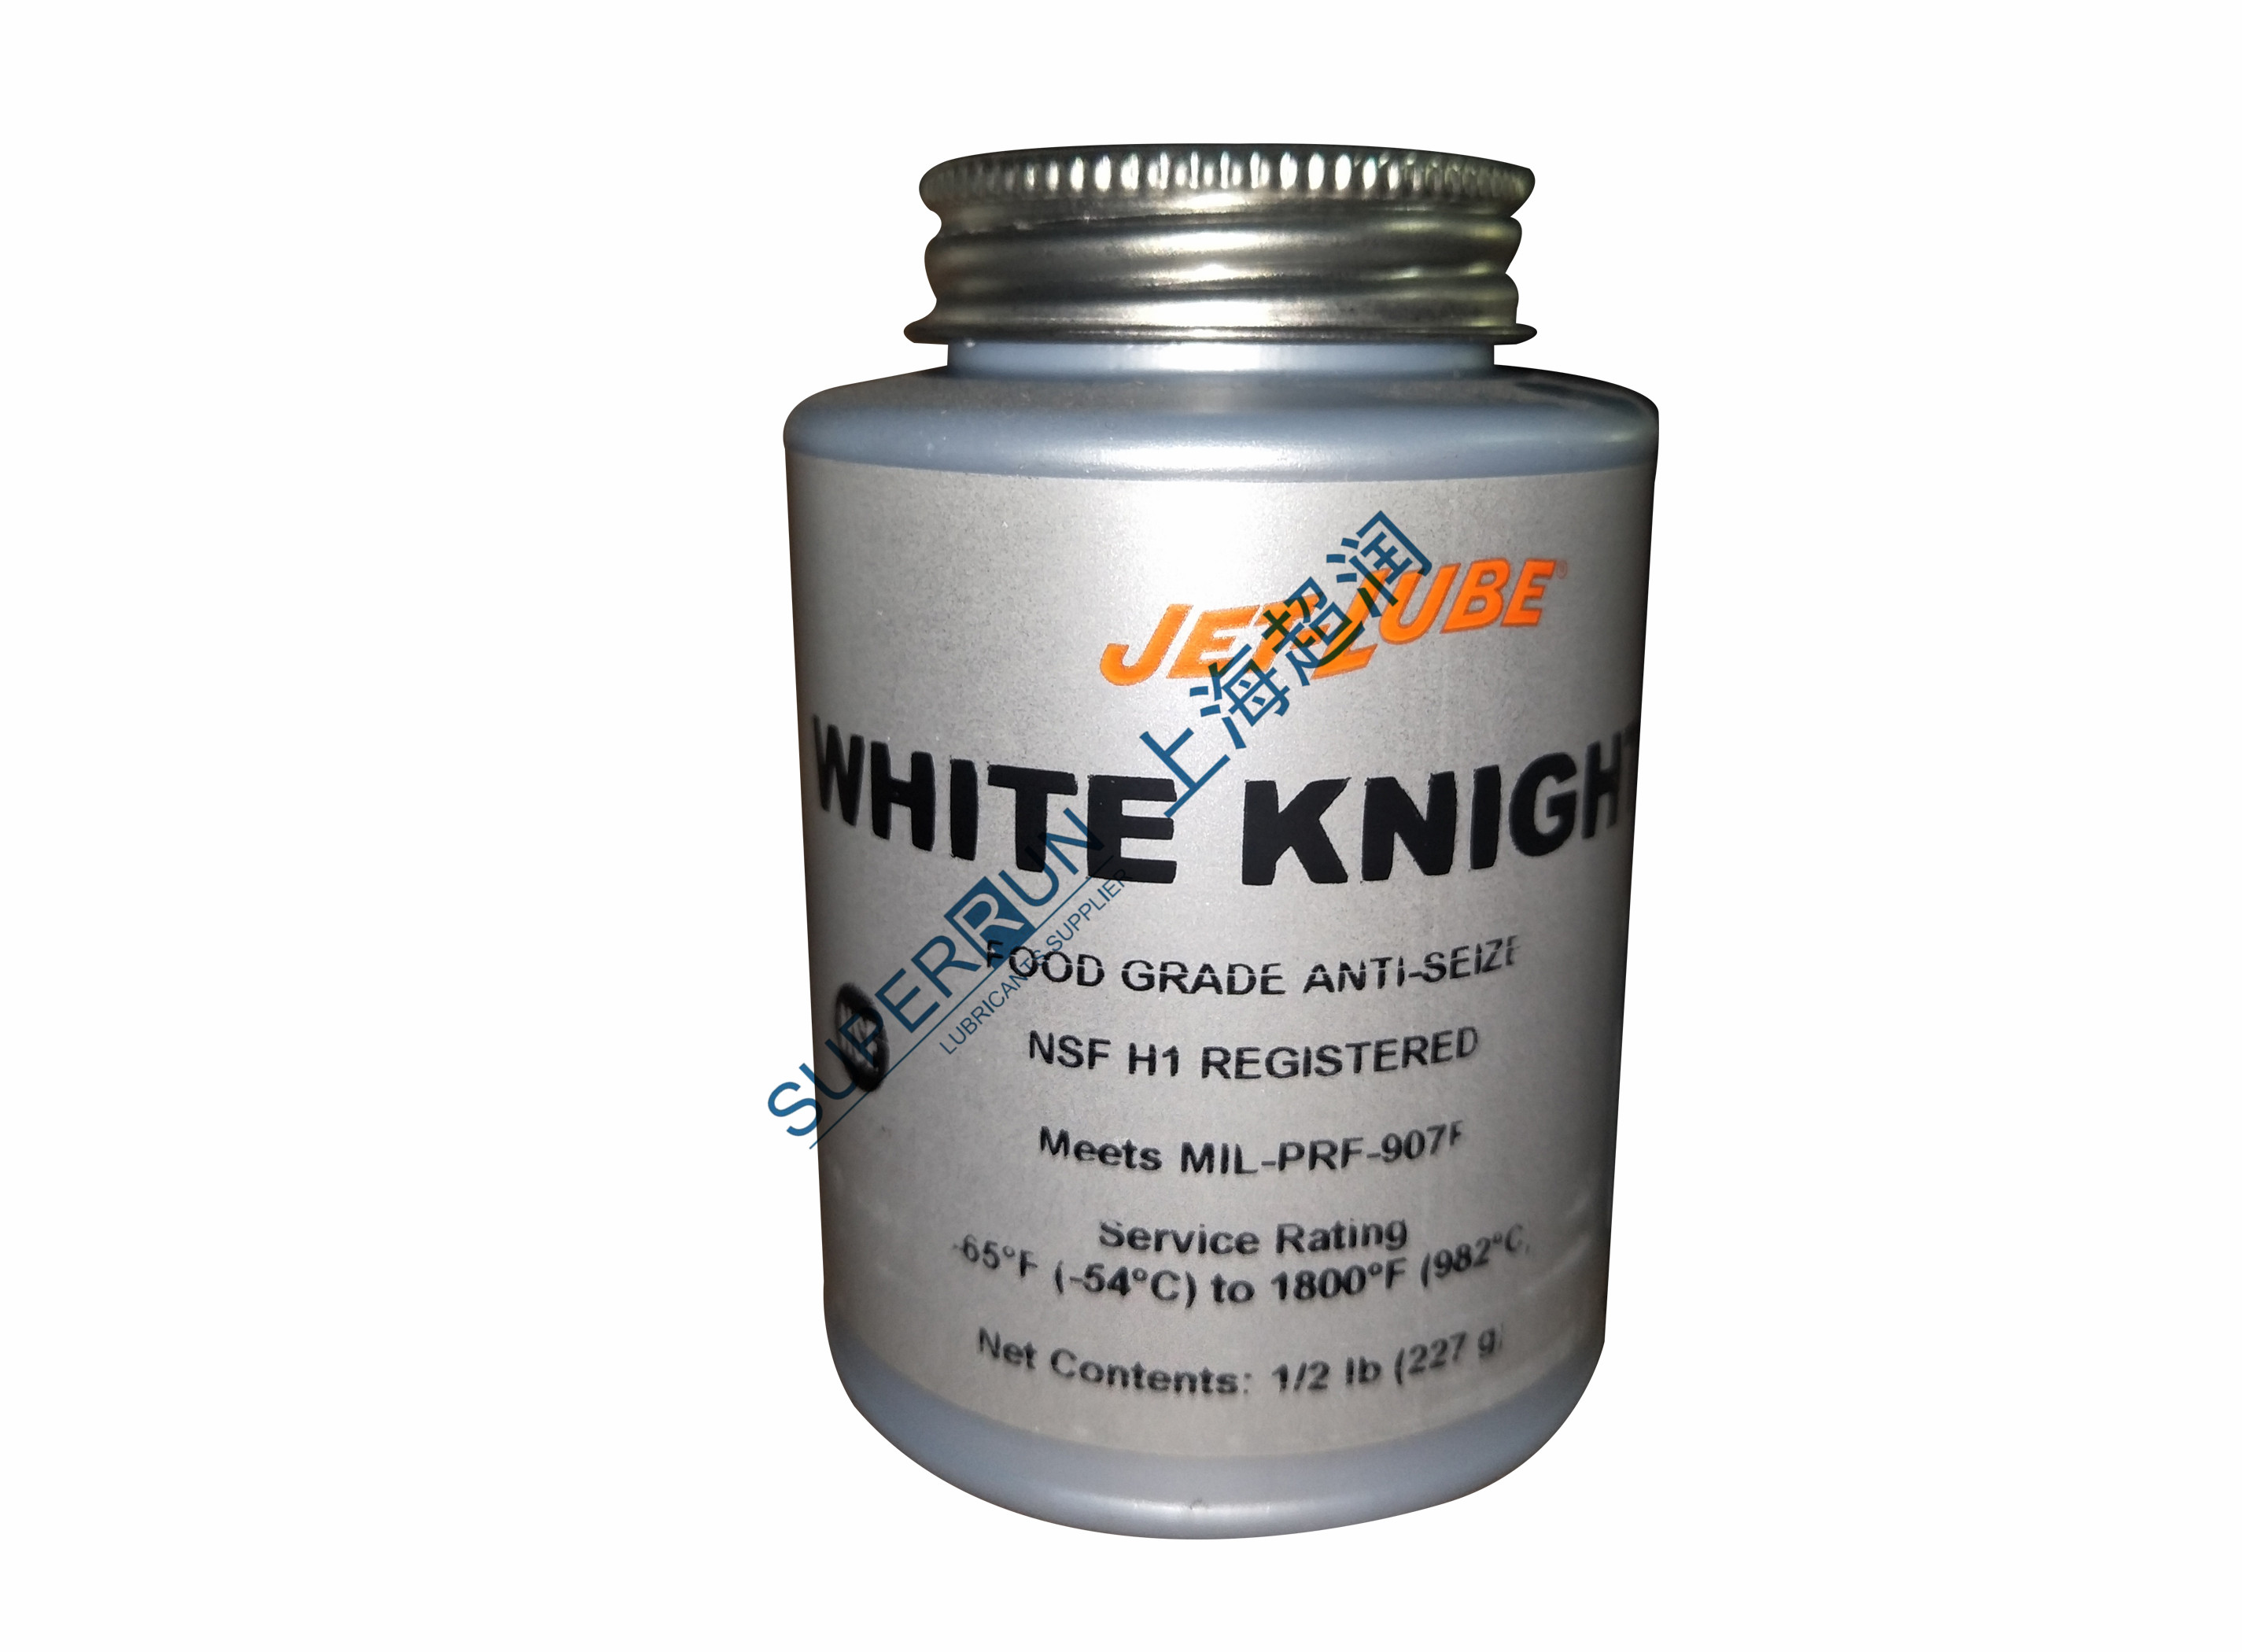 JET-LUBE WHITE KNIGHT食品级润滑脂